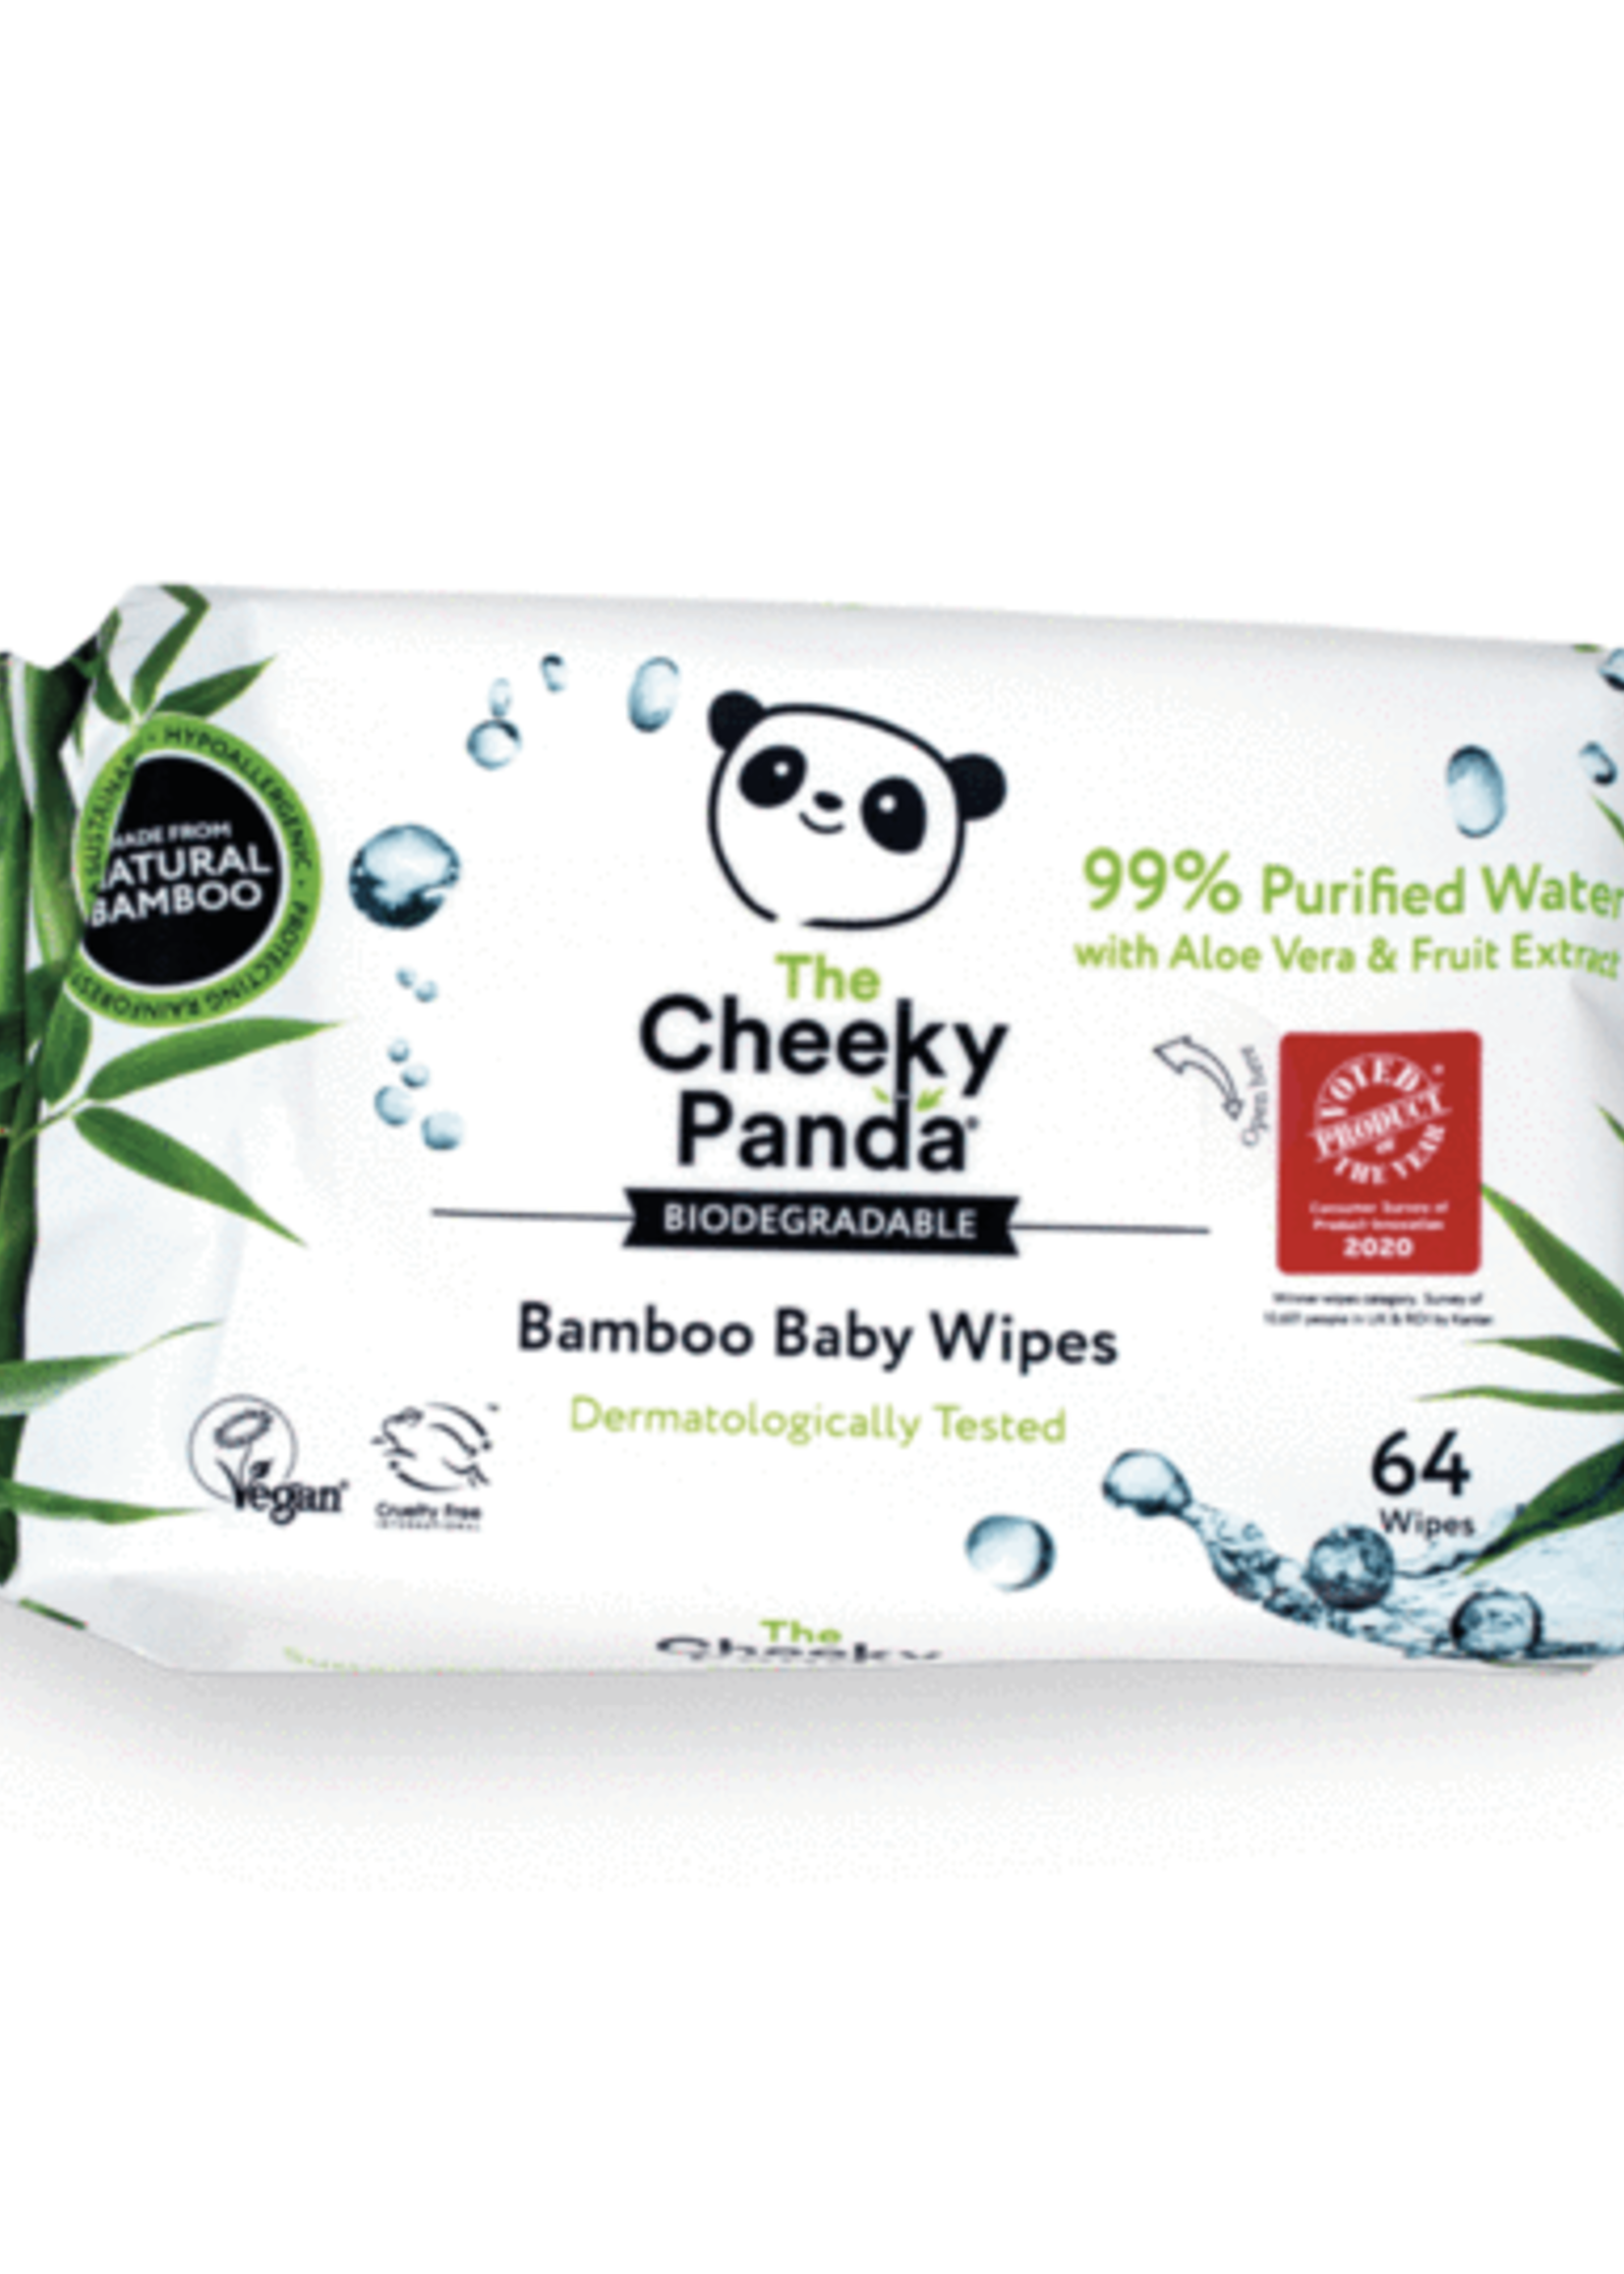 The Cheeky Panda Bamboo Wipes